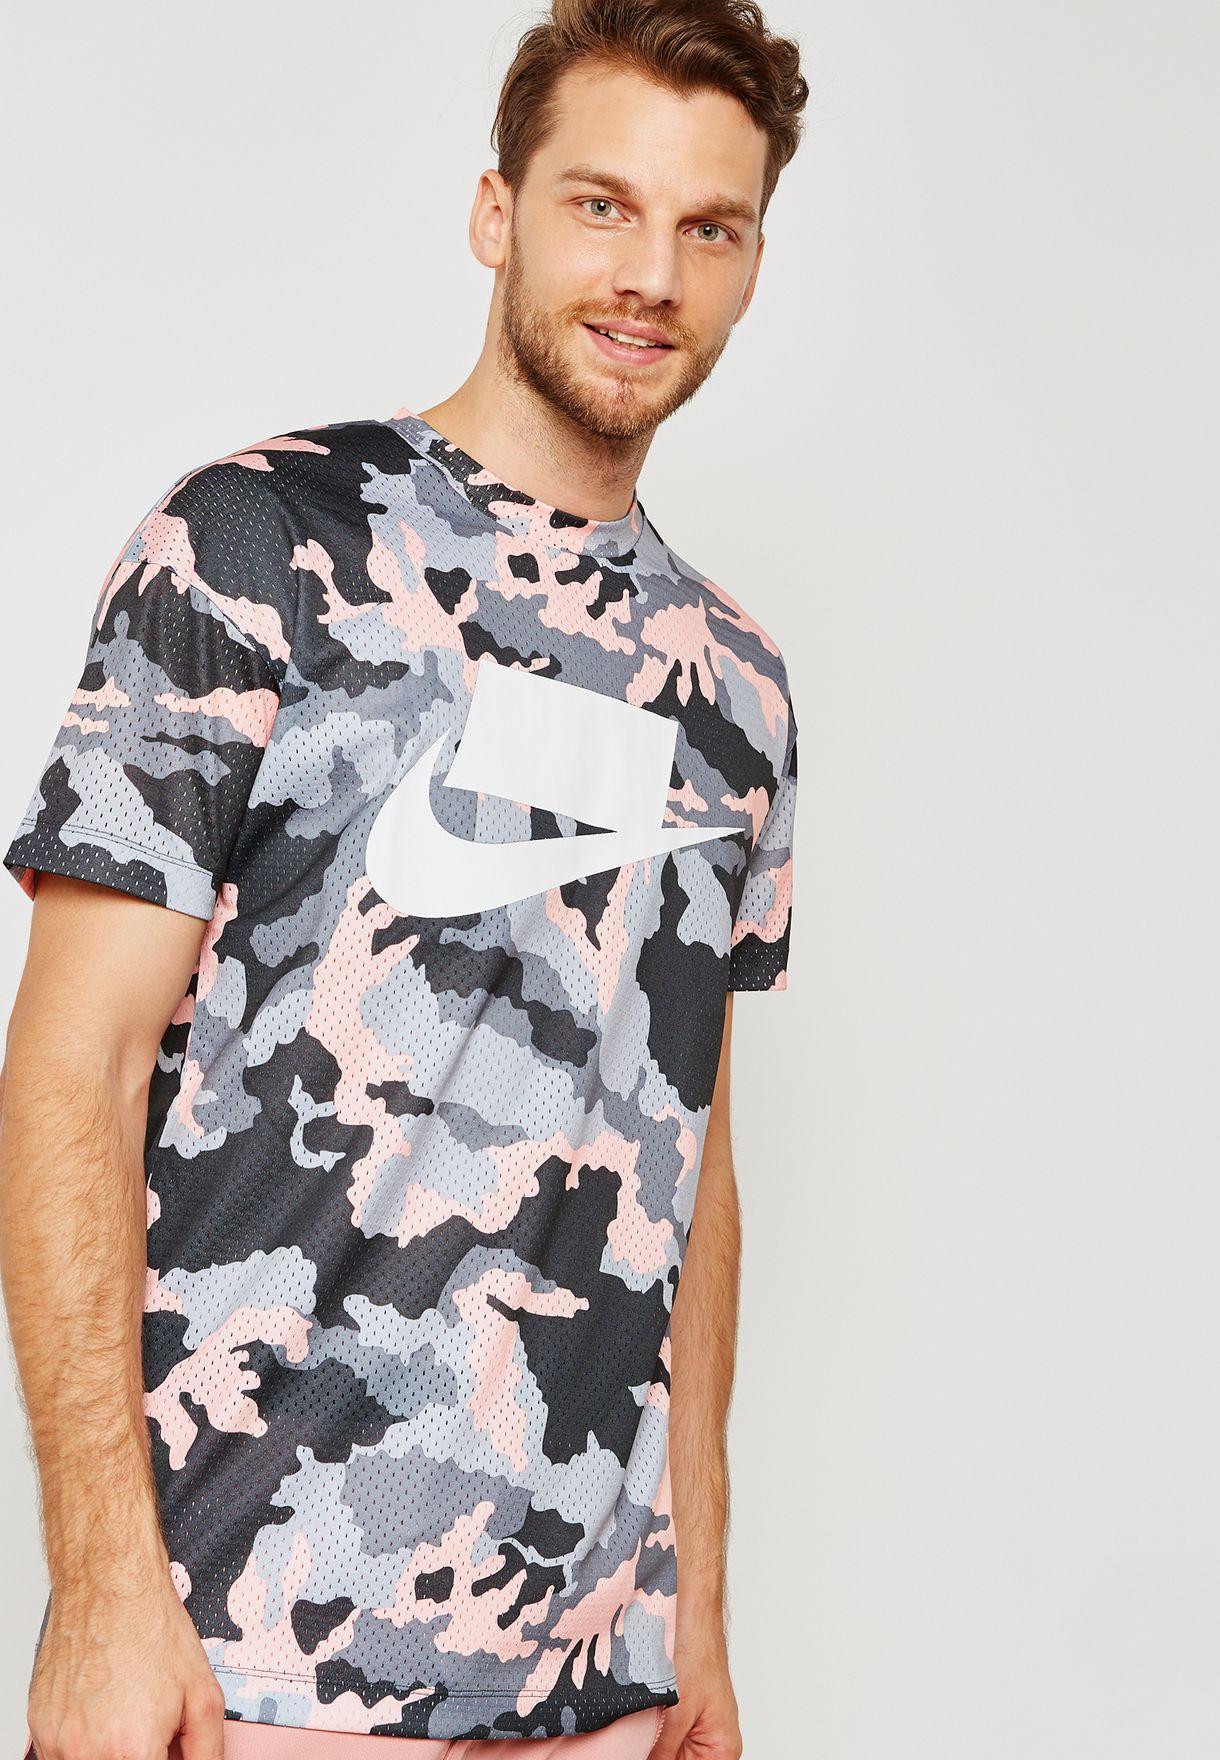 0b63668d7db2e1 Shop Nike prints Mesh Camo T-Shirt 928627-060 for Men in Saudi ...